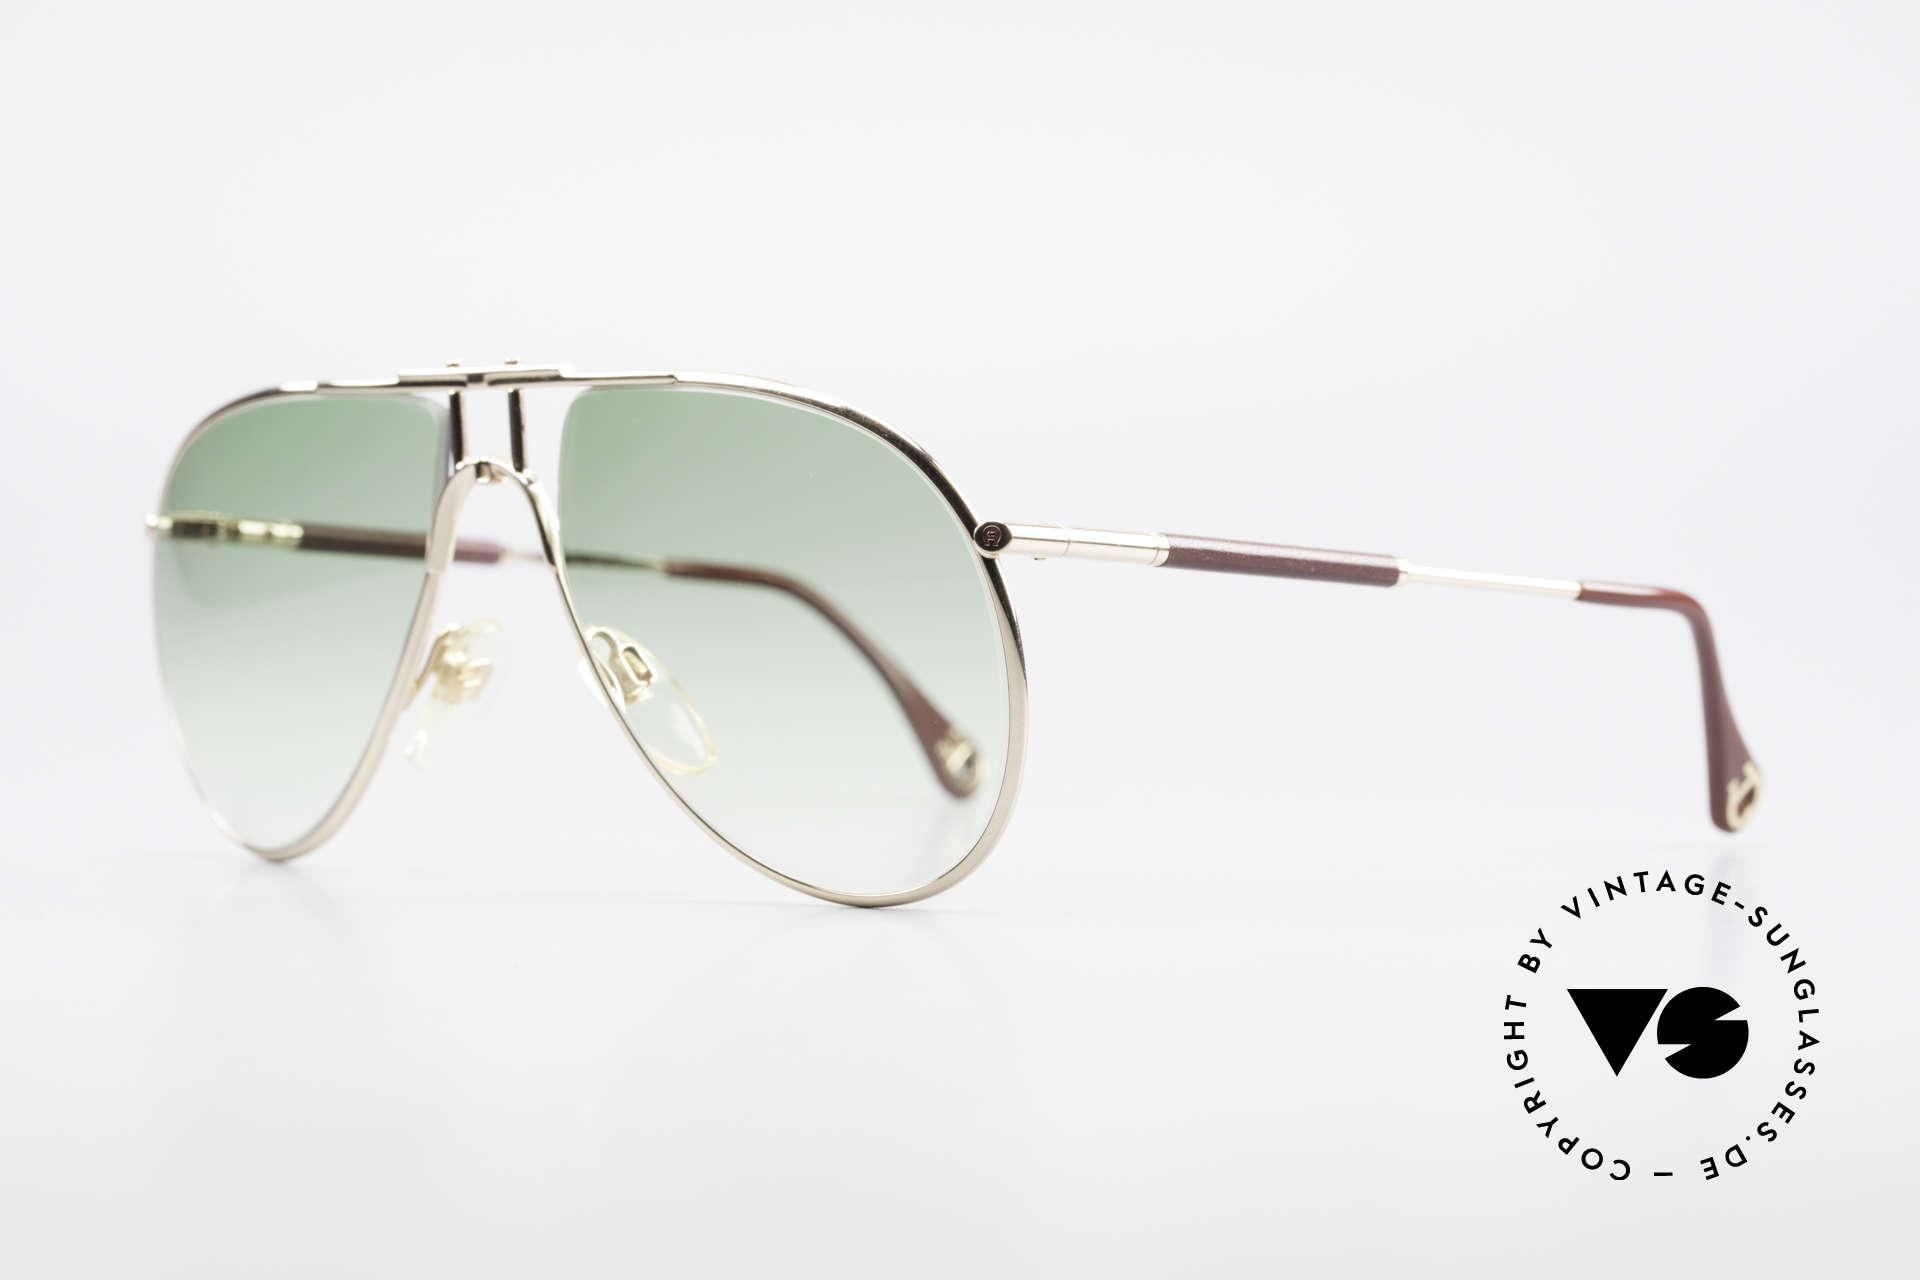 Aigner EA3 Rare 80's Vintage Sunglasses, true 'gentleman sunglasses' - just precious & ultra rare!, Made for Men